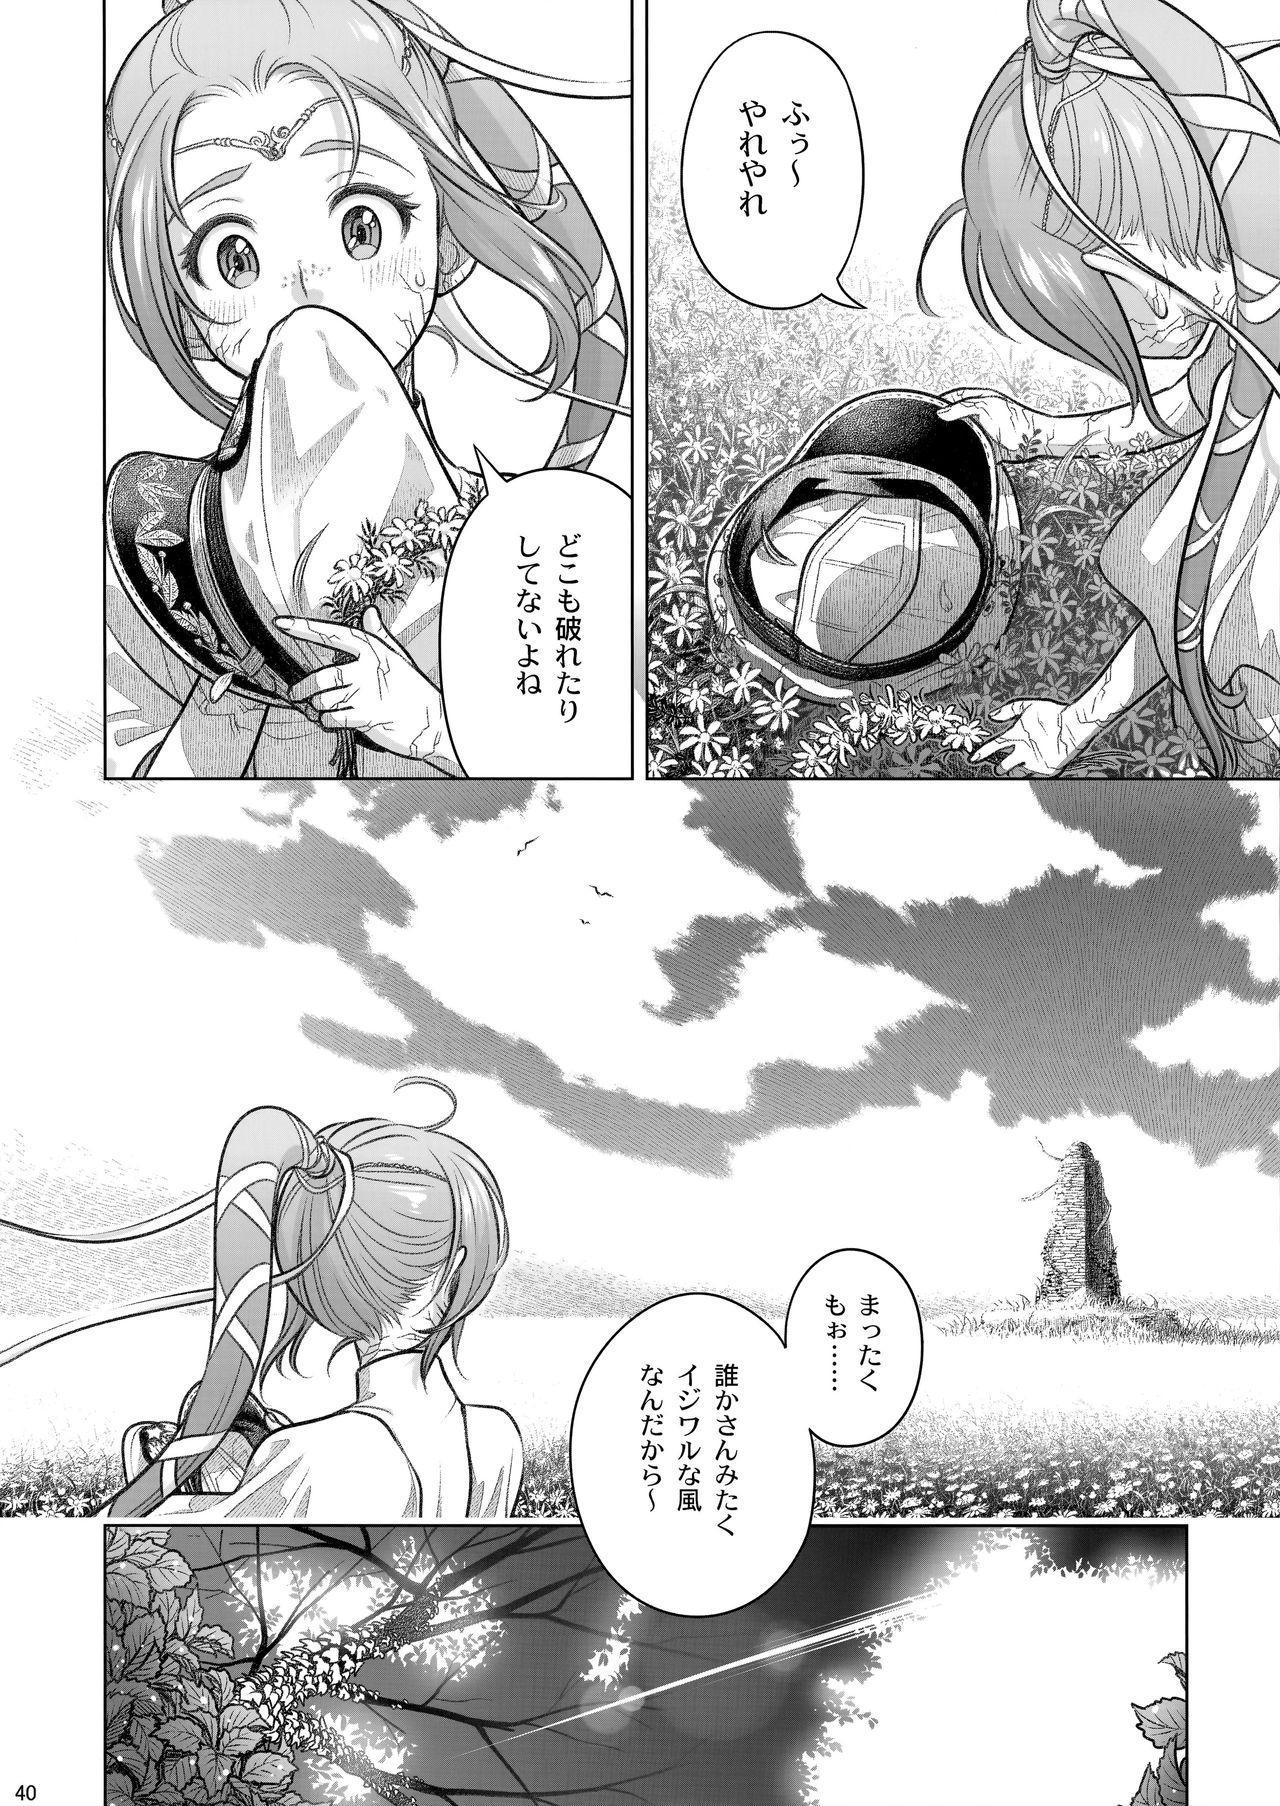 Sorako no Tabi 8 39